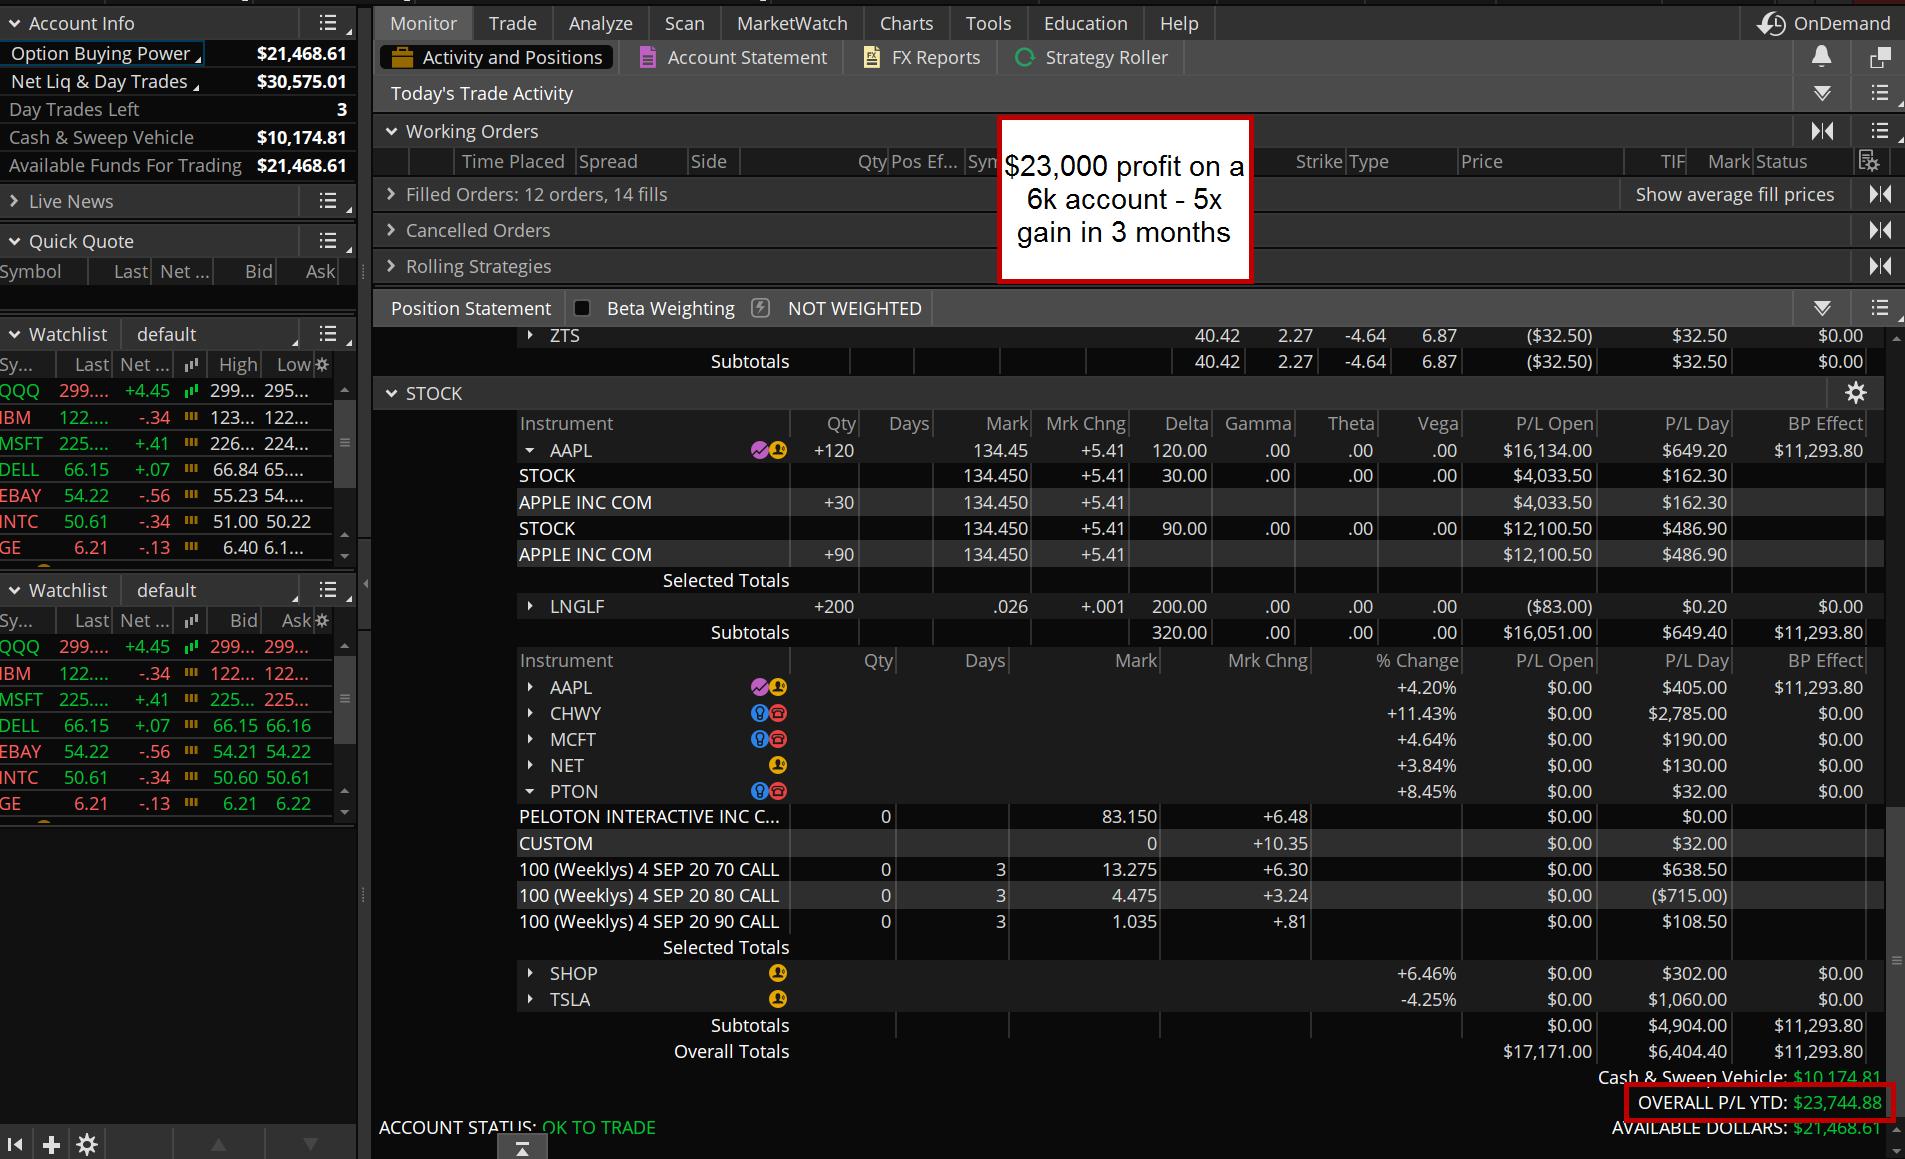 5x account gain 9.1.2020 profits